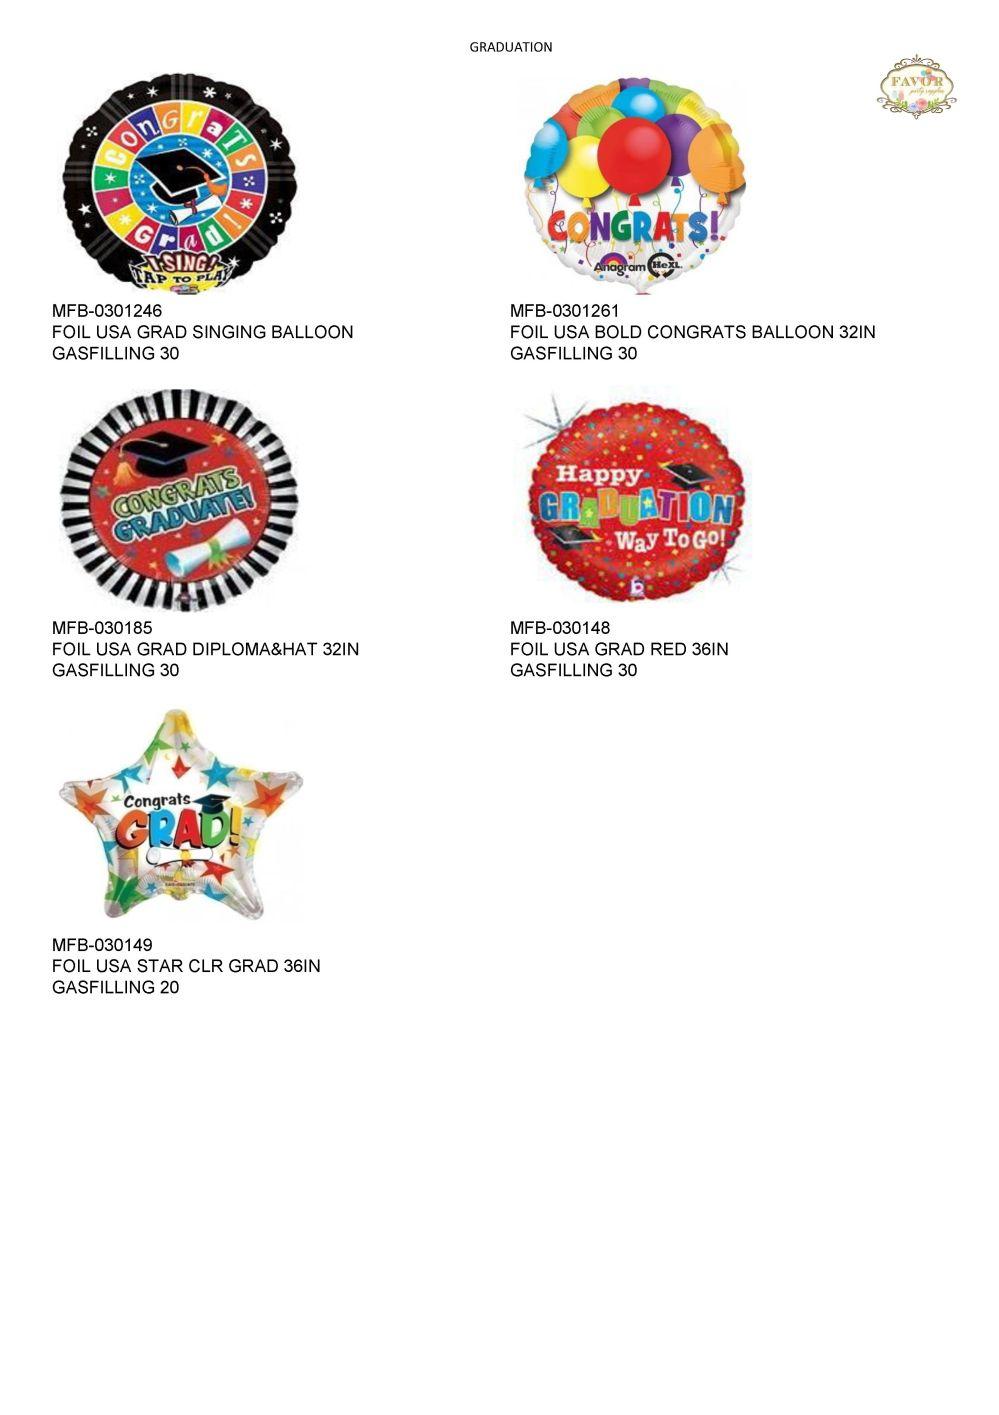 katalog-graduation_5